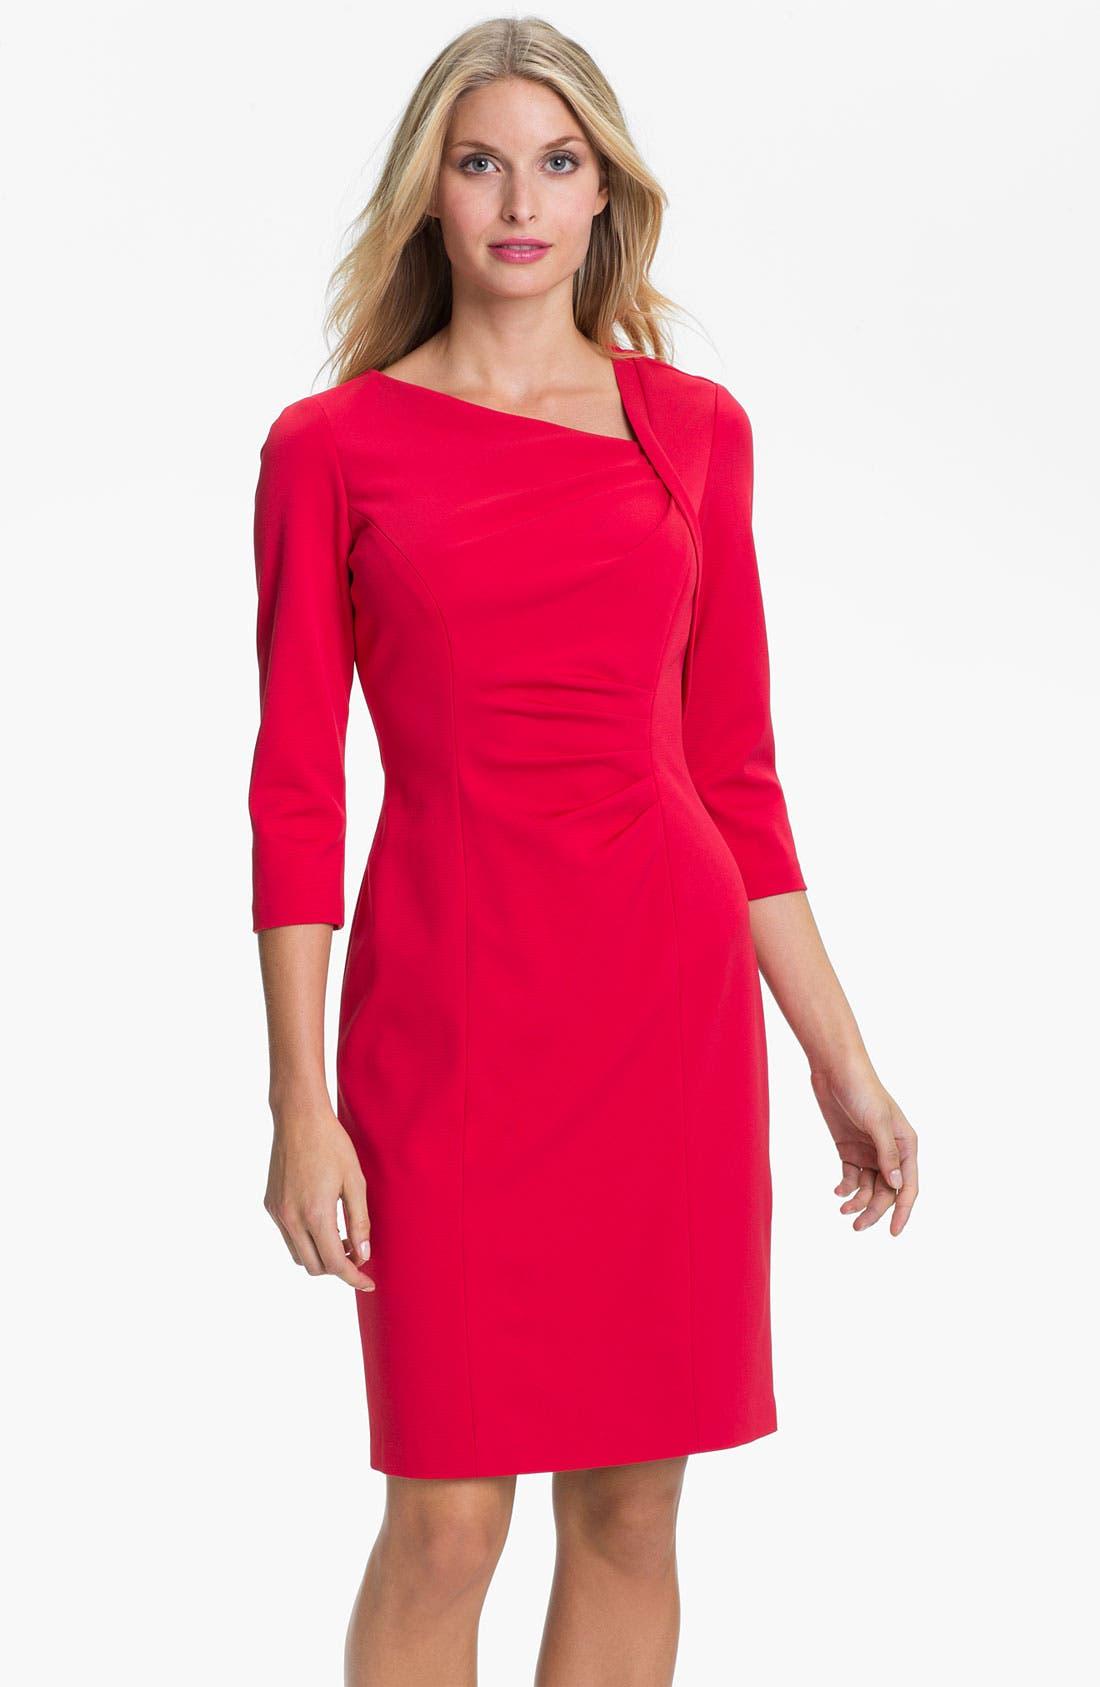 Alternate Image 1 Selected - Kay Unger Asymmetrical Neck Knit Sheath Dress